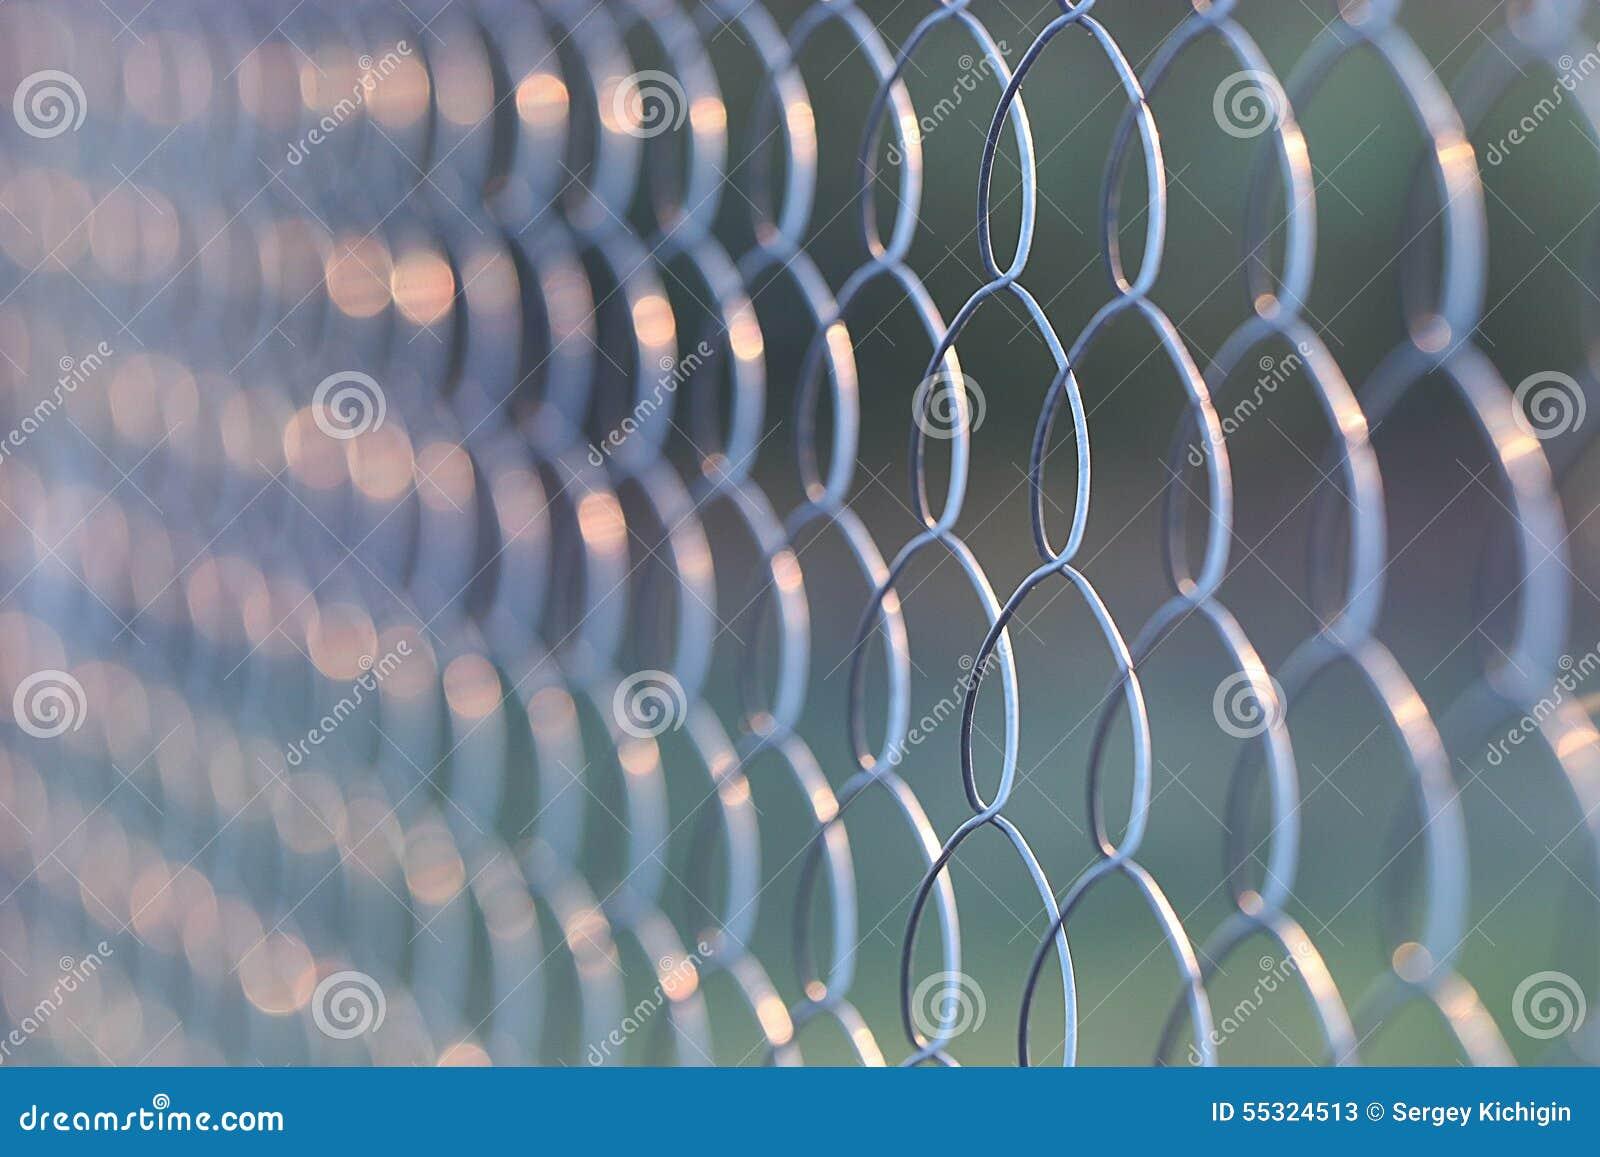 Barrière de fabrication en métal de fil